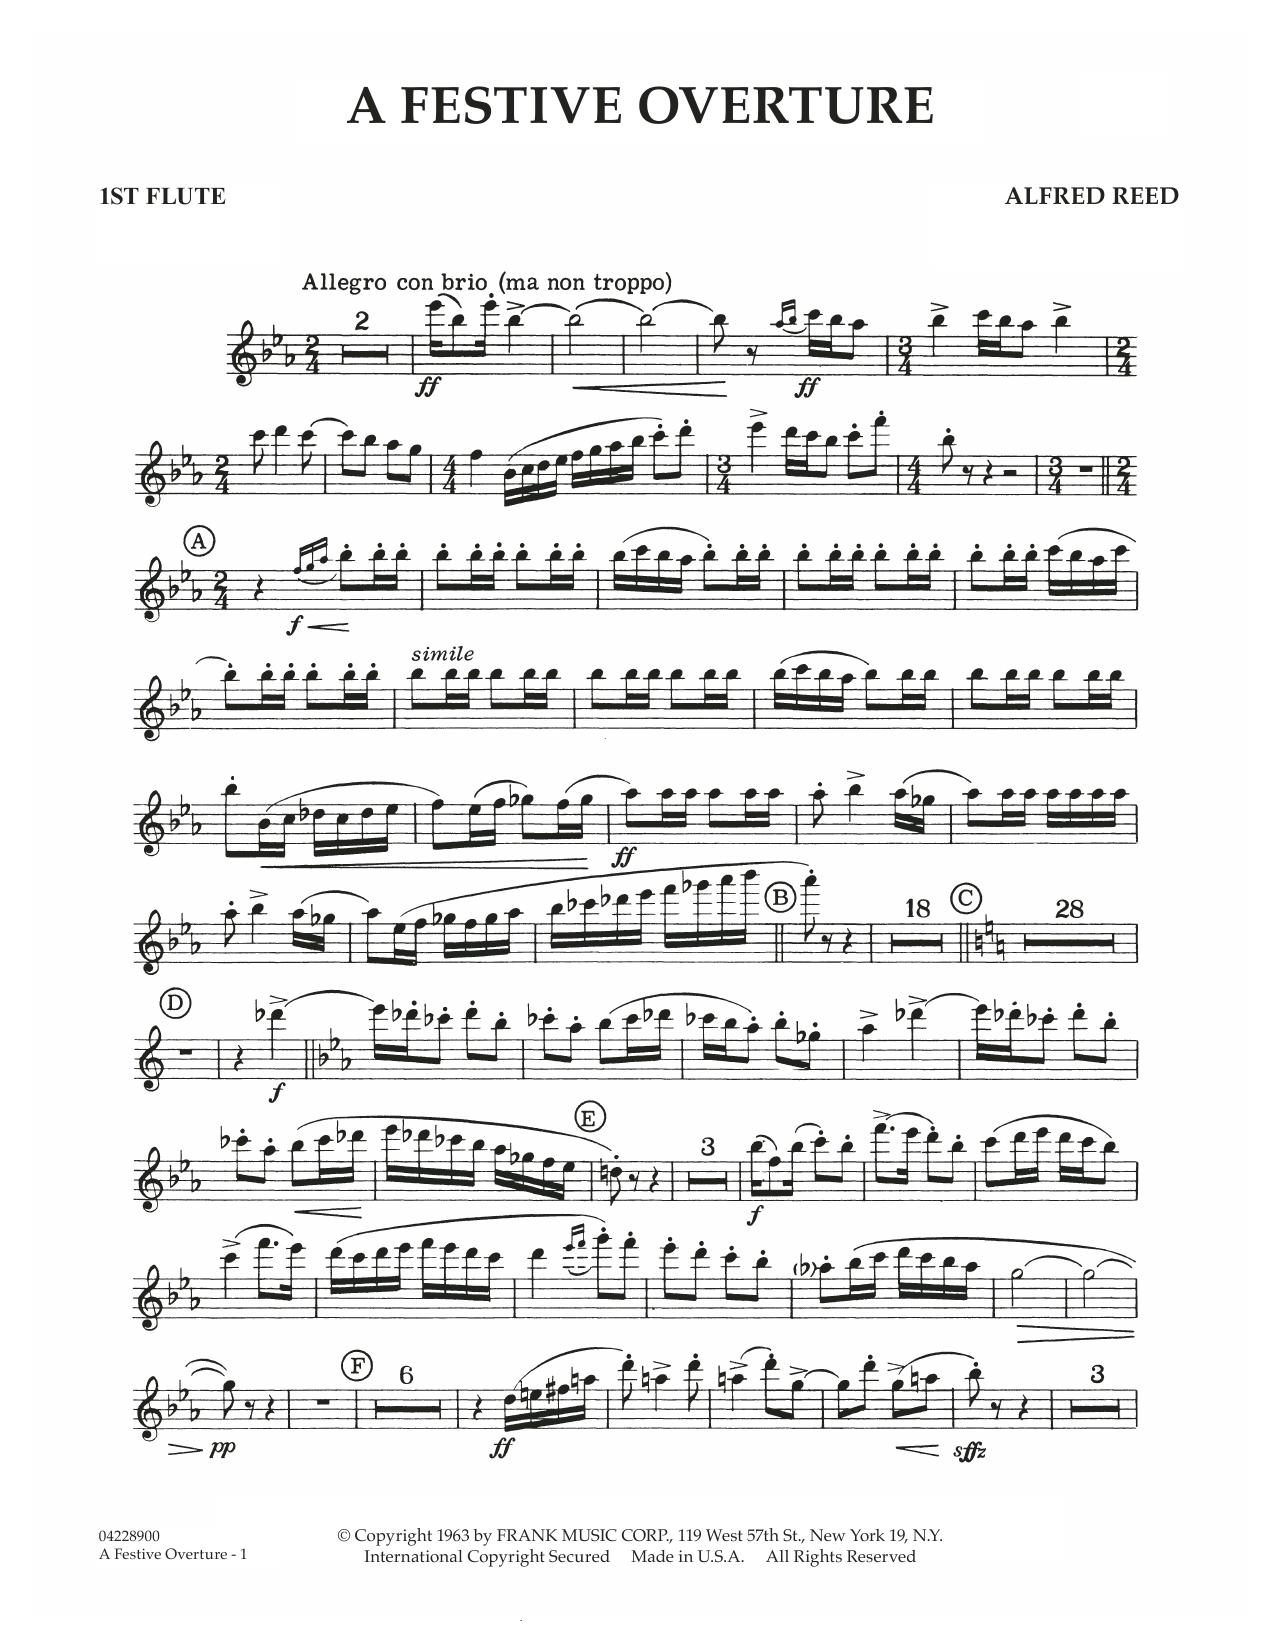 A Festive Overture - 1st Flute (Concert Band)